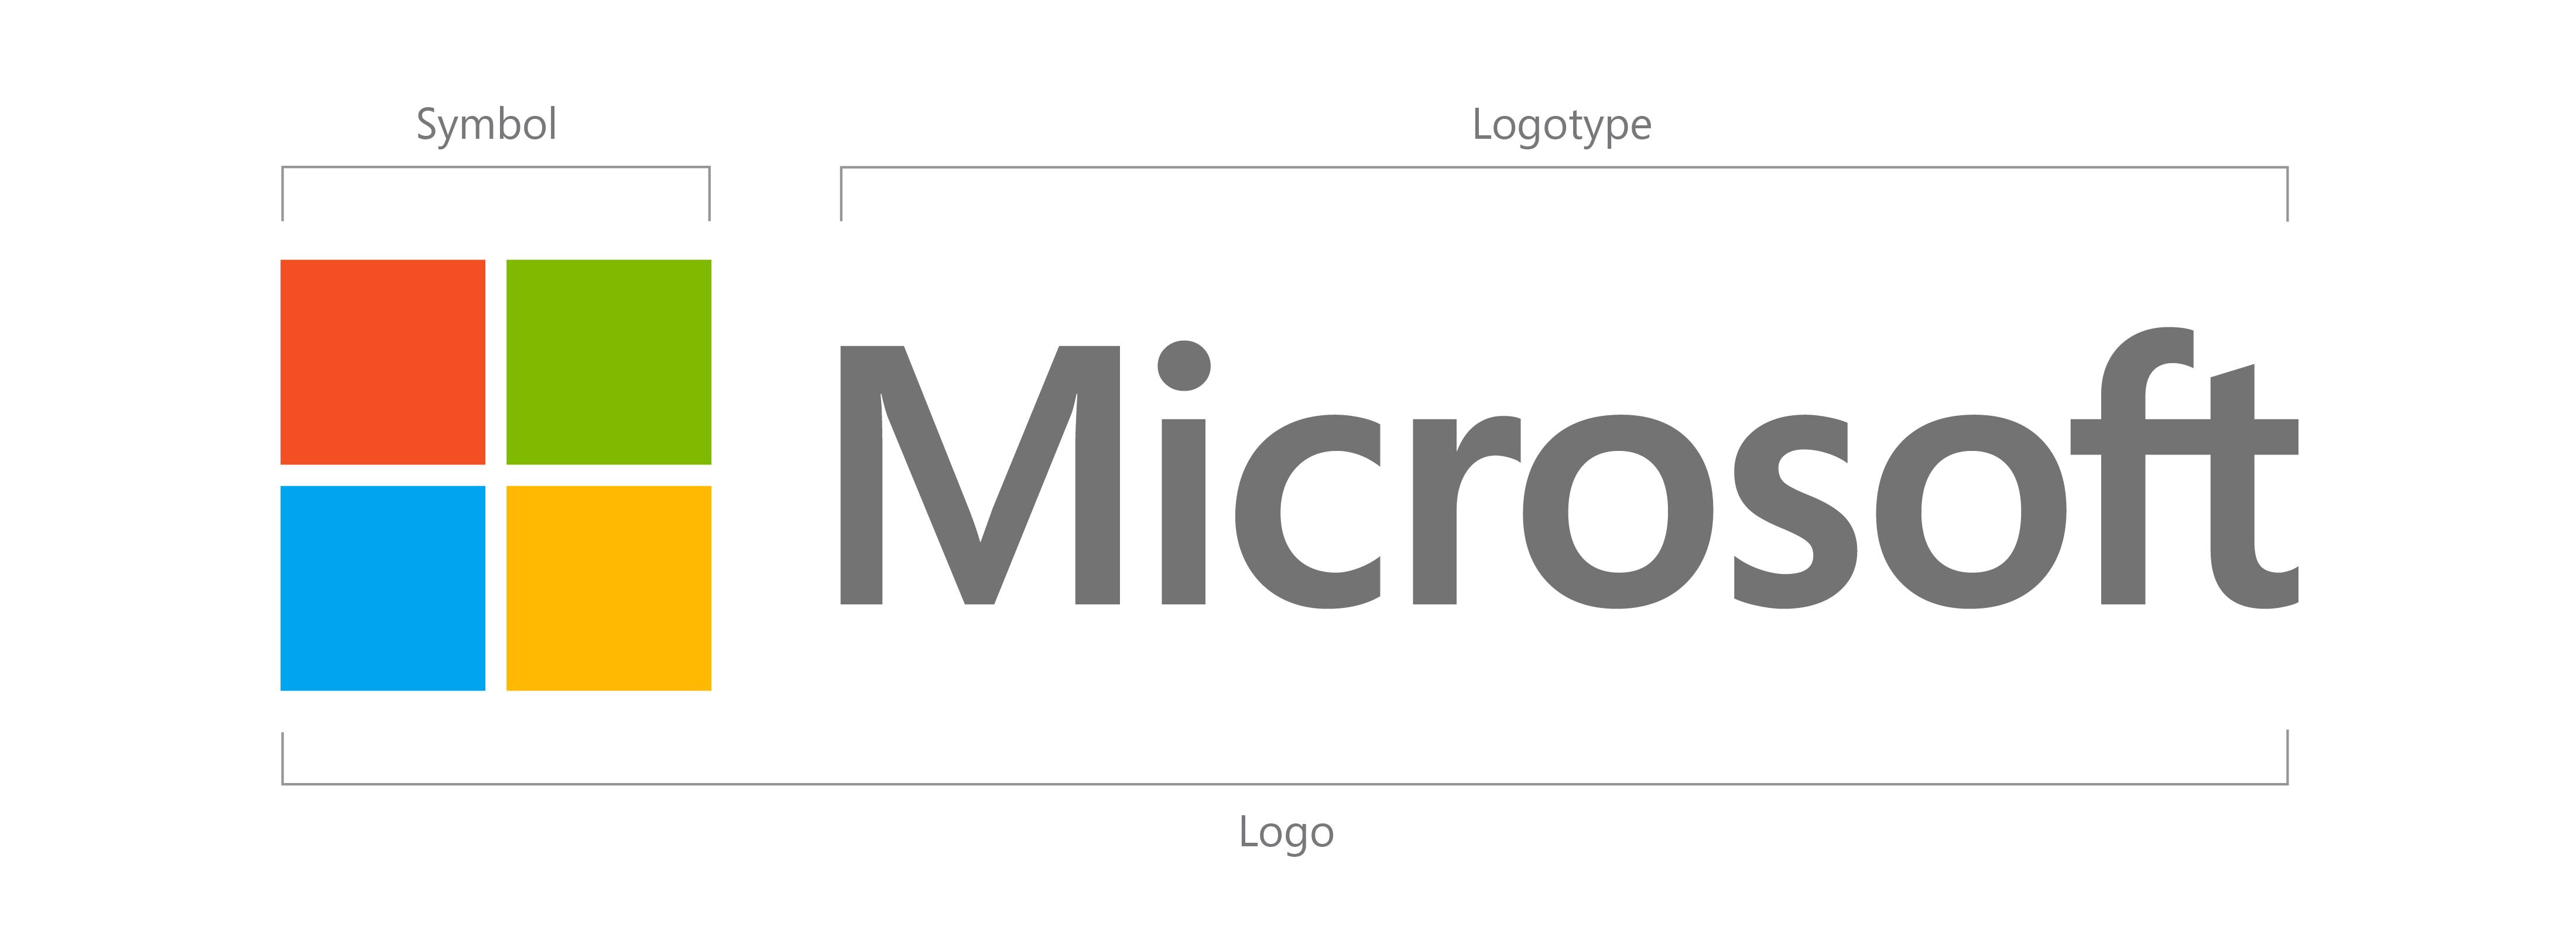 Microsoft's new logo 2012